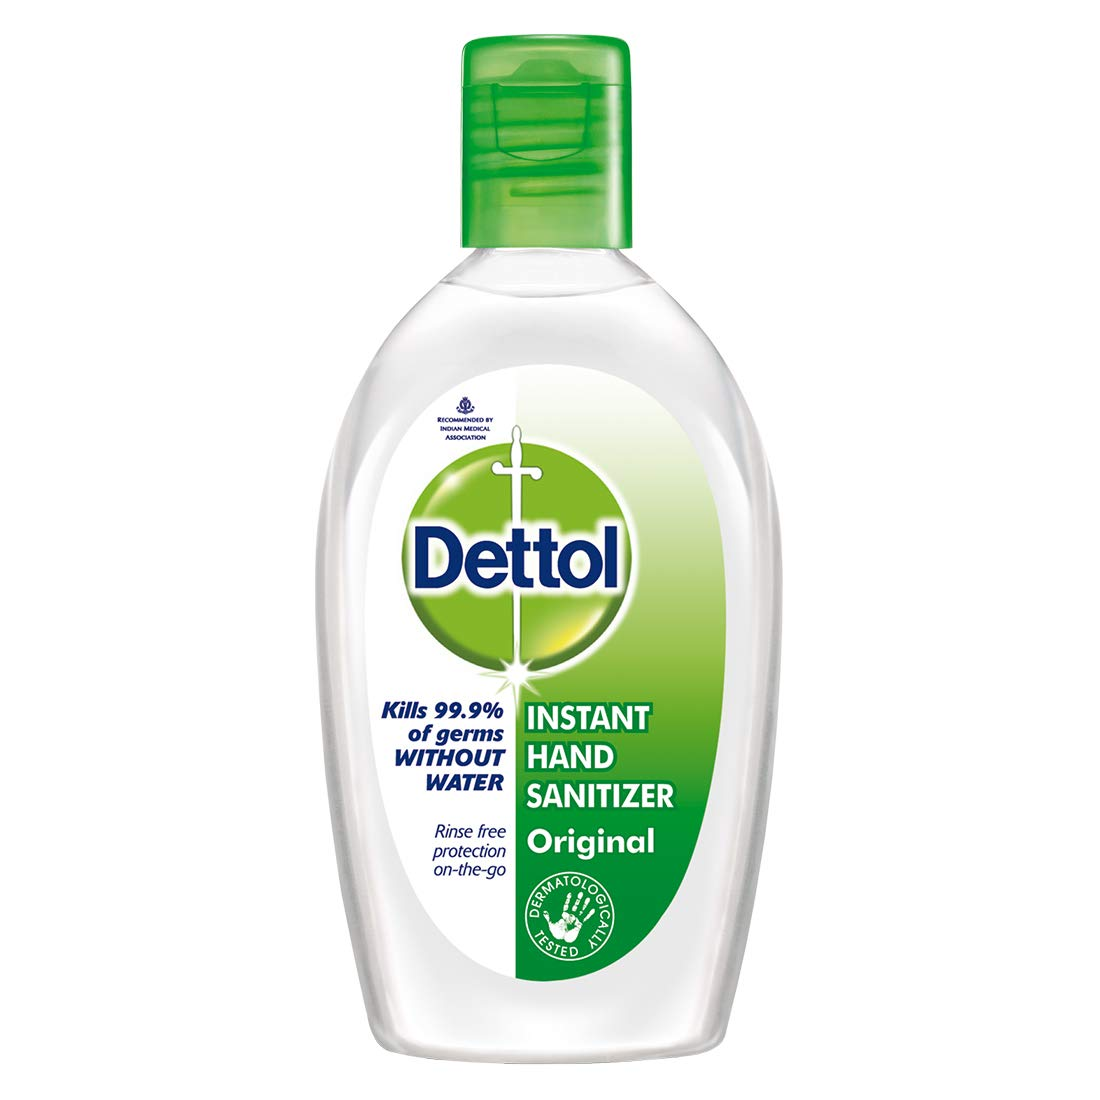 Dettol Original Germ Protection Alcohol based Hand Sanitizer, 50ml